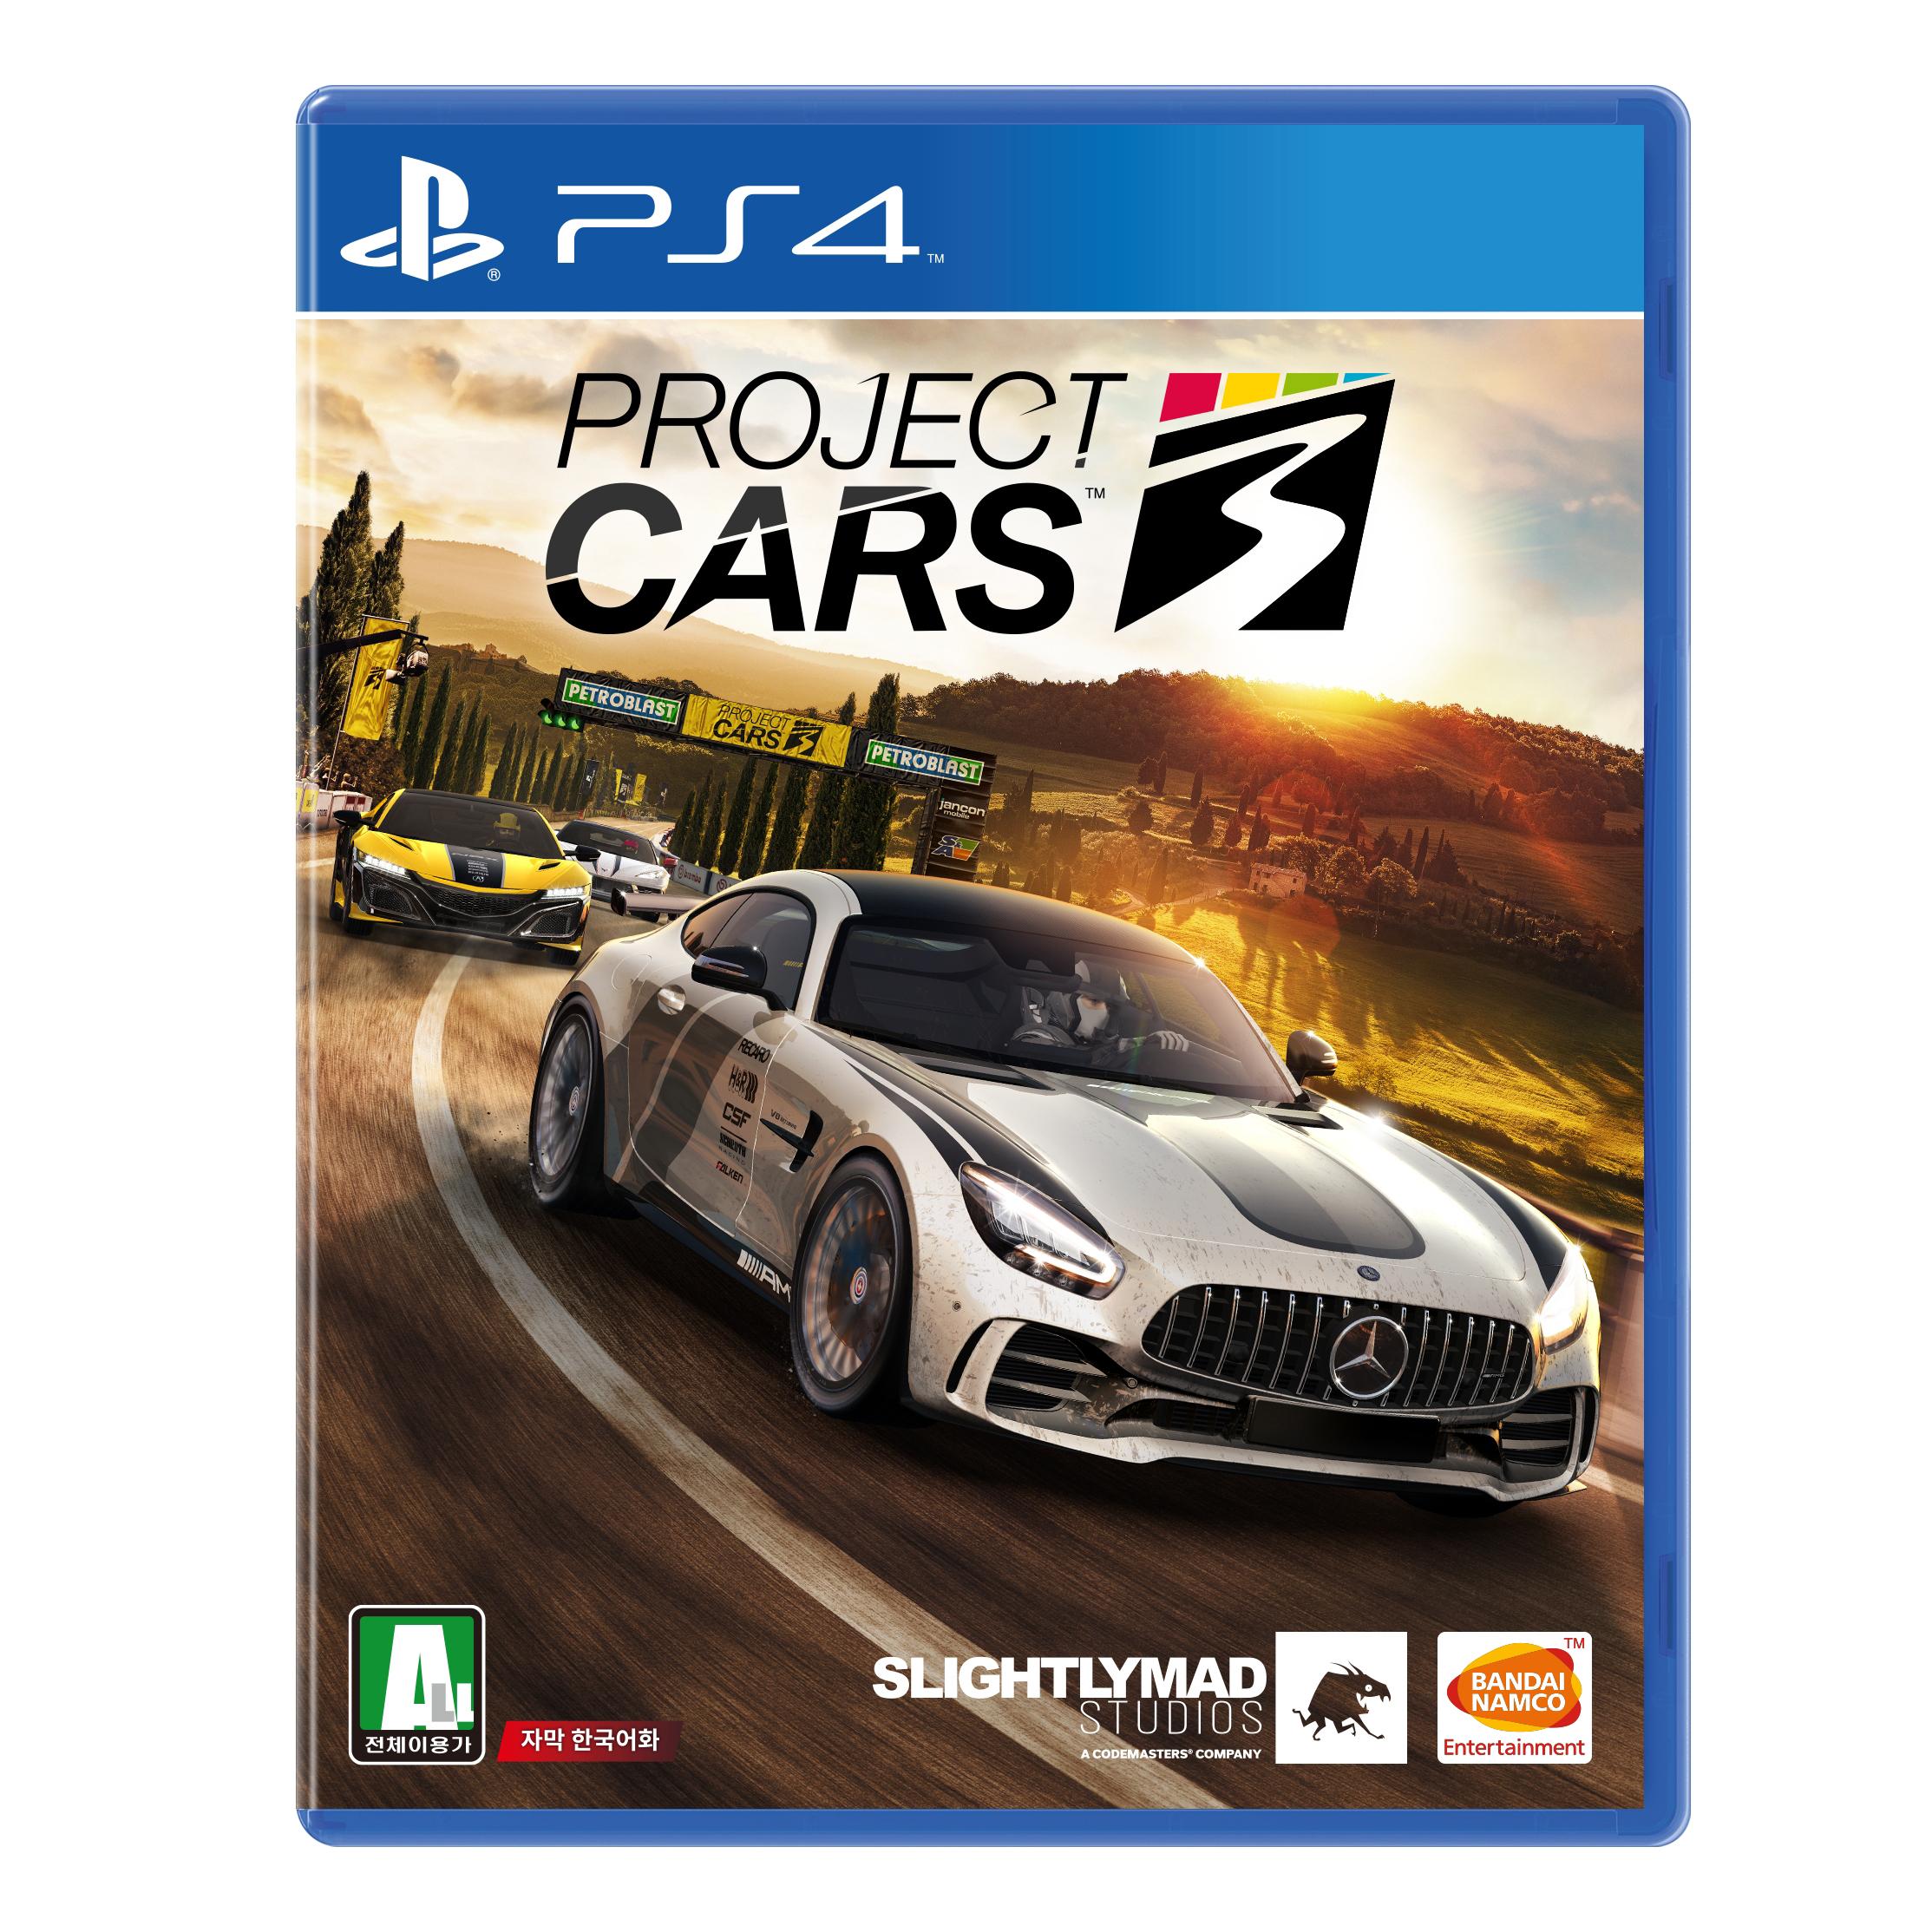 PS4 프로젝트 카스 3 한글판, 단일상품